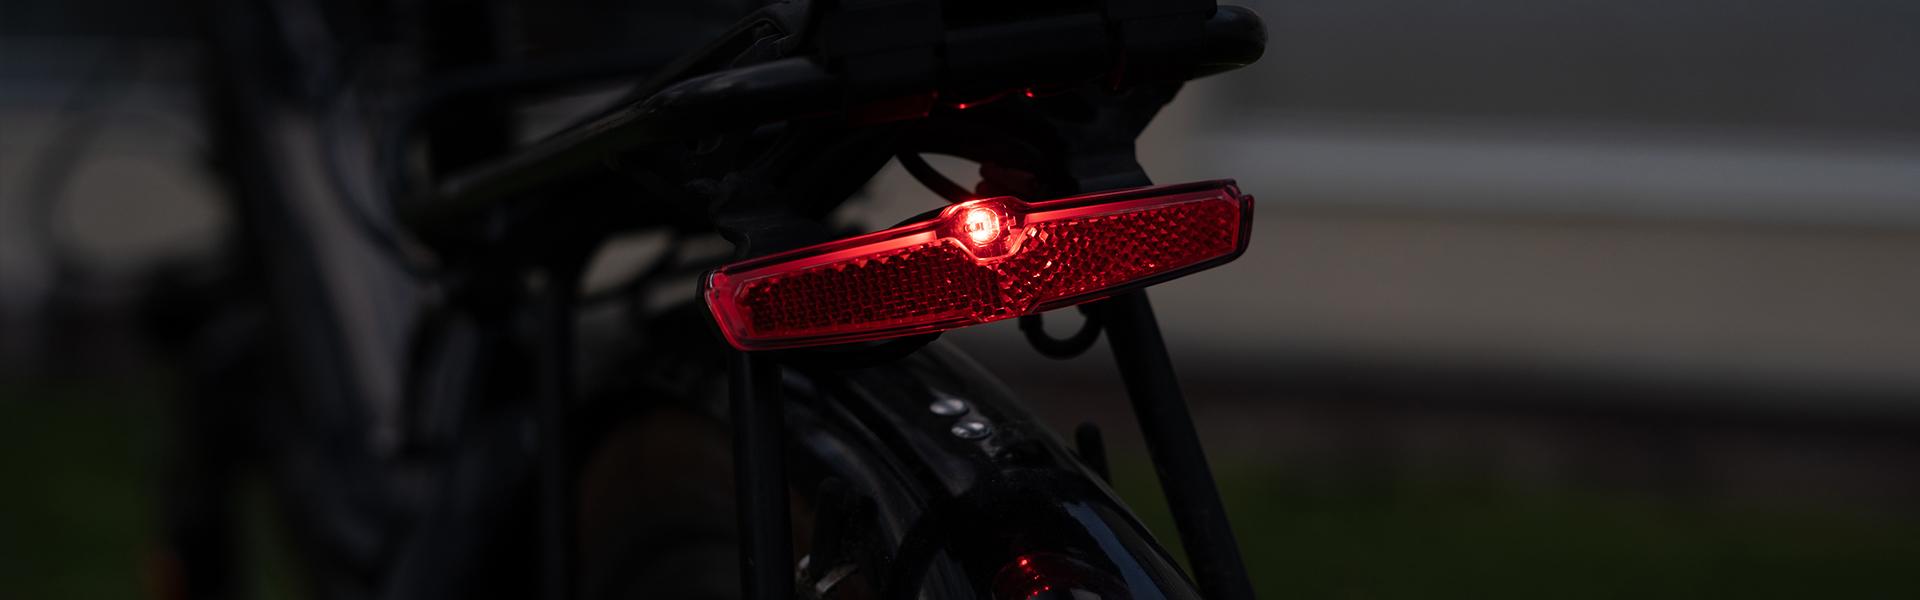 Sate-lite OSRAM 50lux ebike light ISO 6721-1 StVZO  eletric bike headlight with StVZO ECE reflector front fork 6-58V